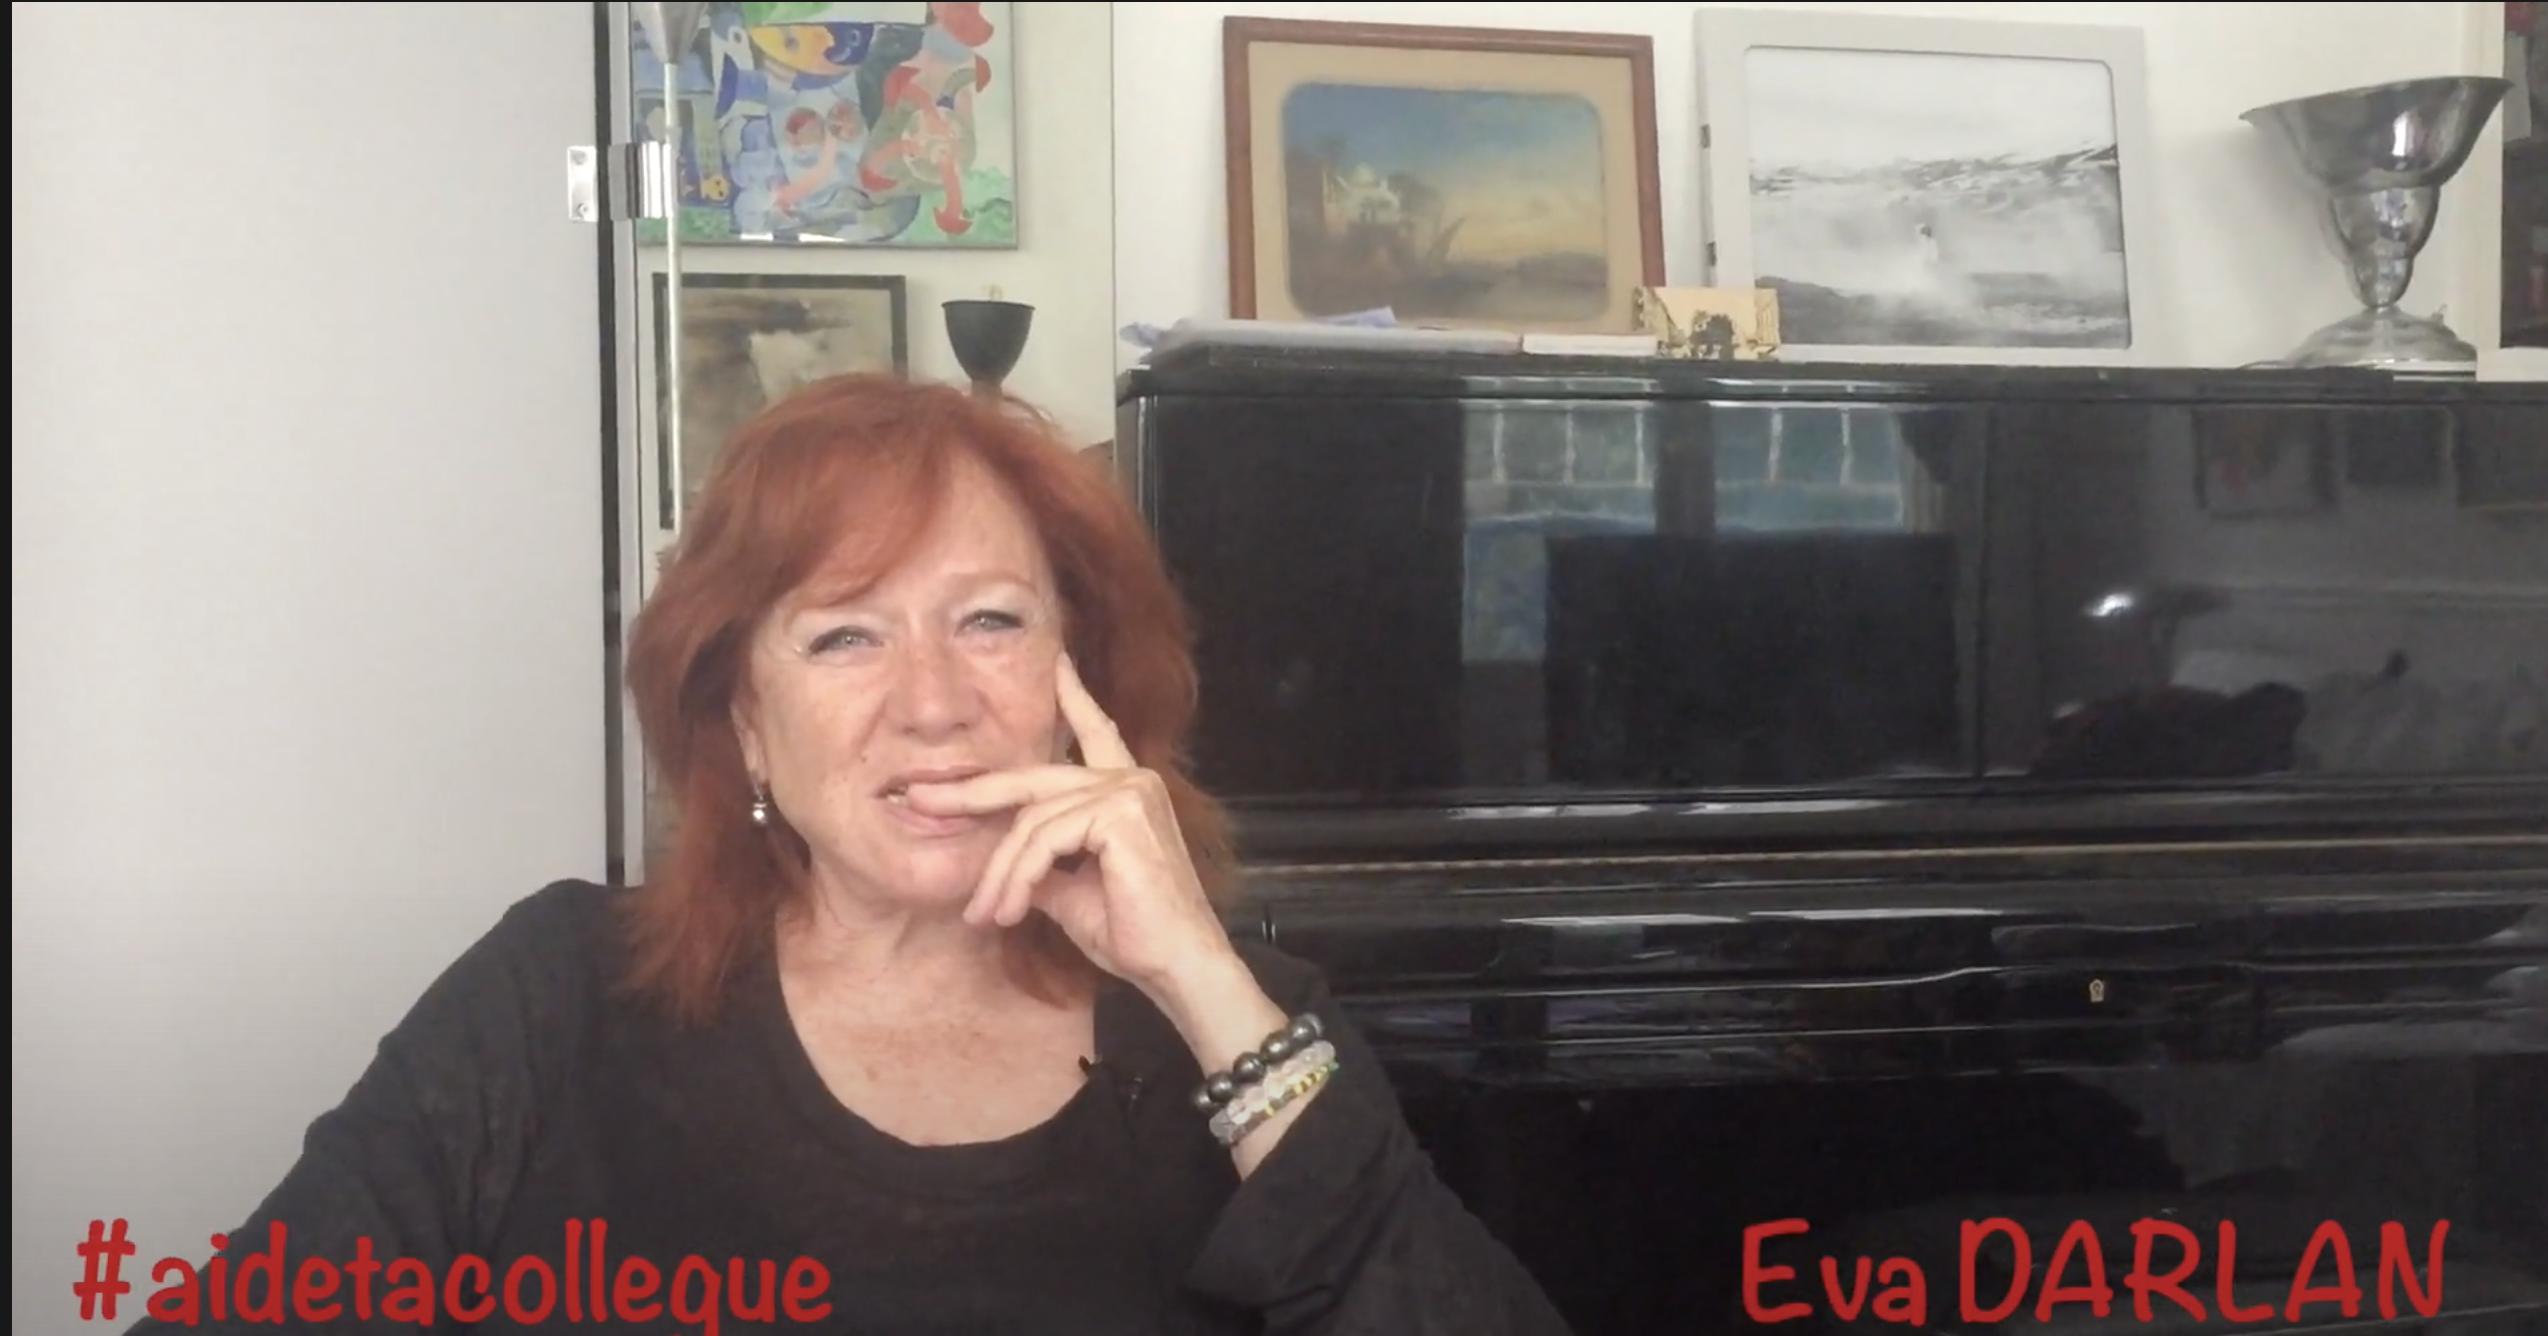 #aidetacollegue: Eva DARLAN aime l'opération